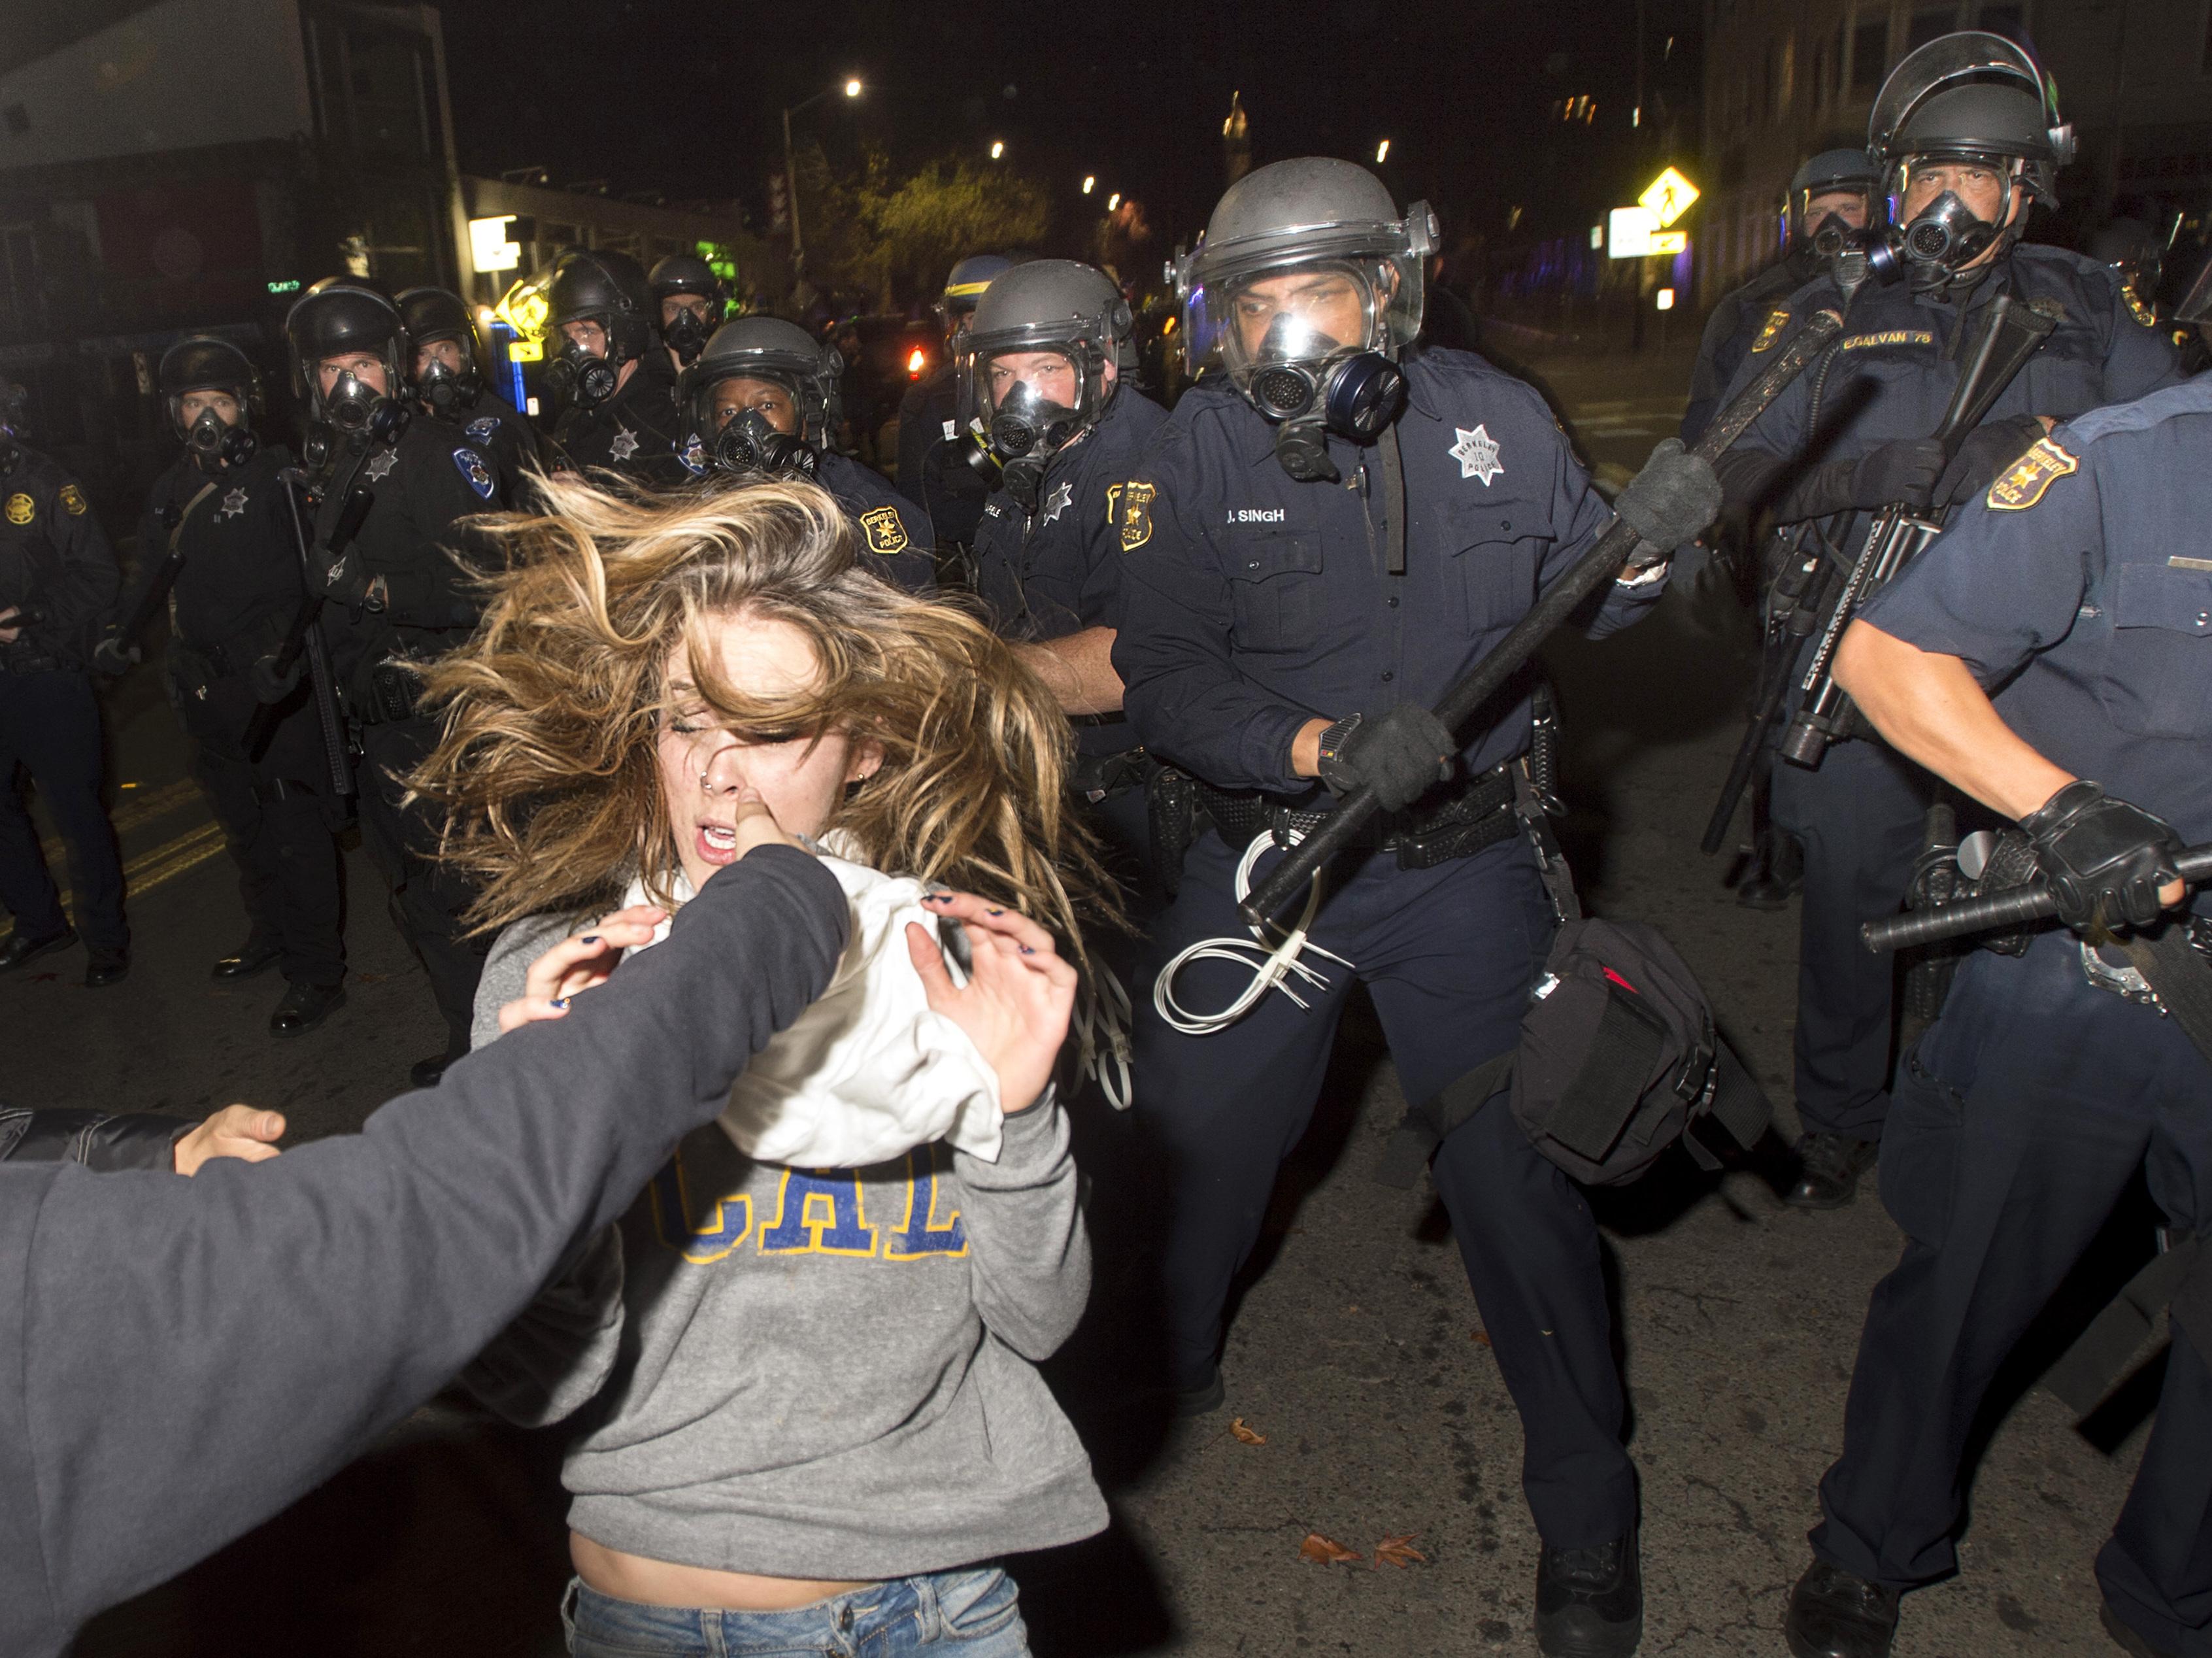 Student Calendar Uc Berkeley Berkeley Summer Sessions Live Learn Grow Protests Over Police Killings Turn Violent In Berkeley